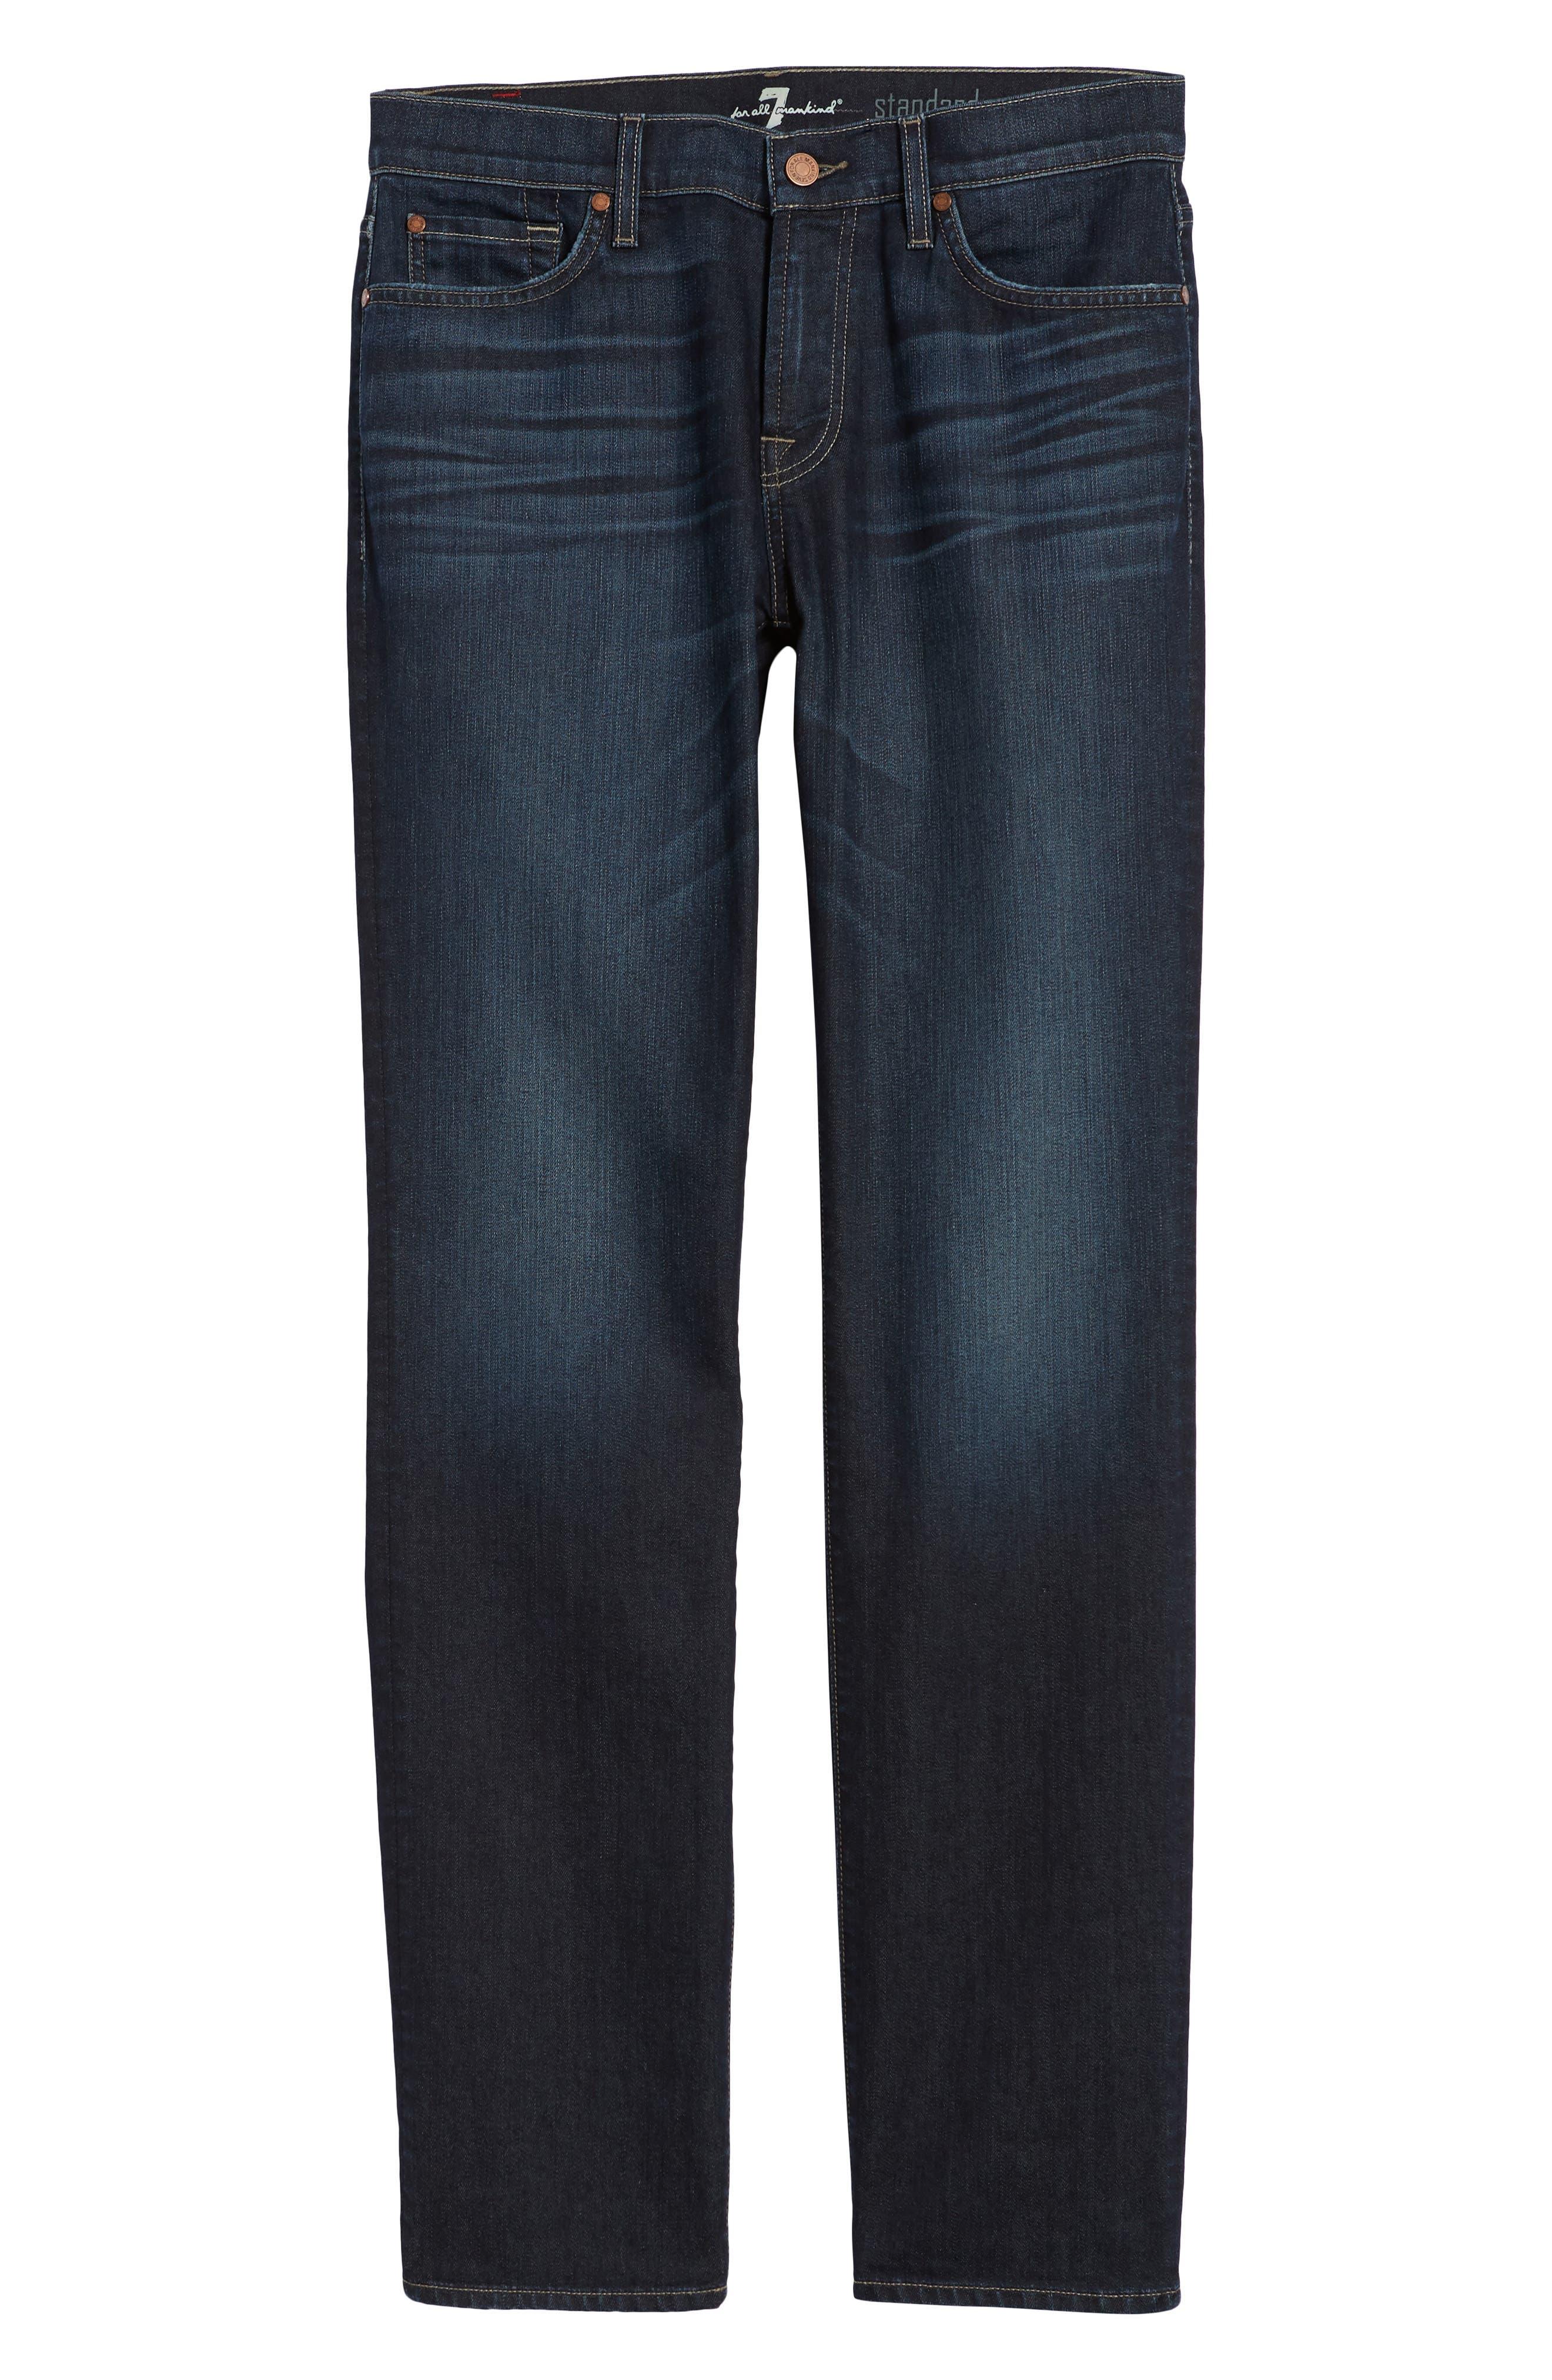 Airweft Standard Straight Leg Jeans,                             Alternate thumbnail 6, color,                             405